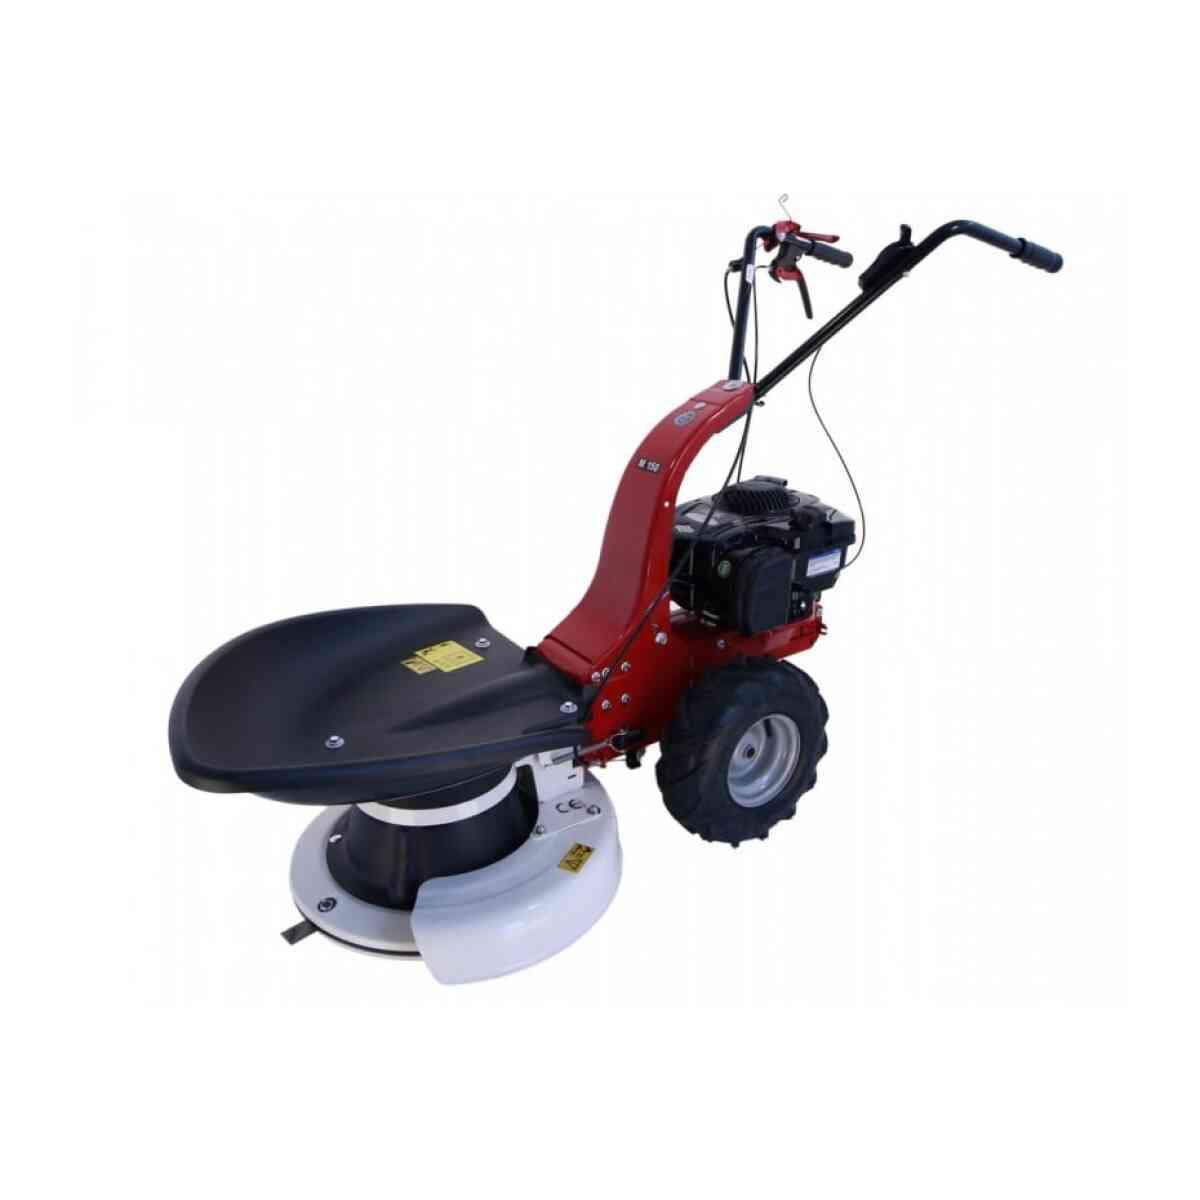 motocositoare rotativa o mac m150 bs 625 exi series 57cm padure gardina.ro 28